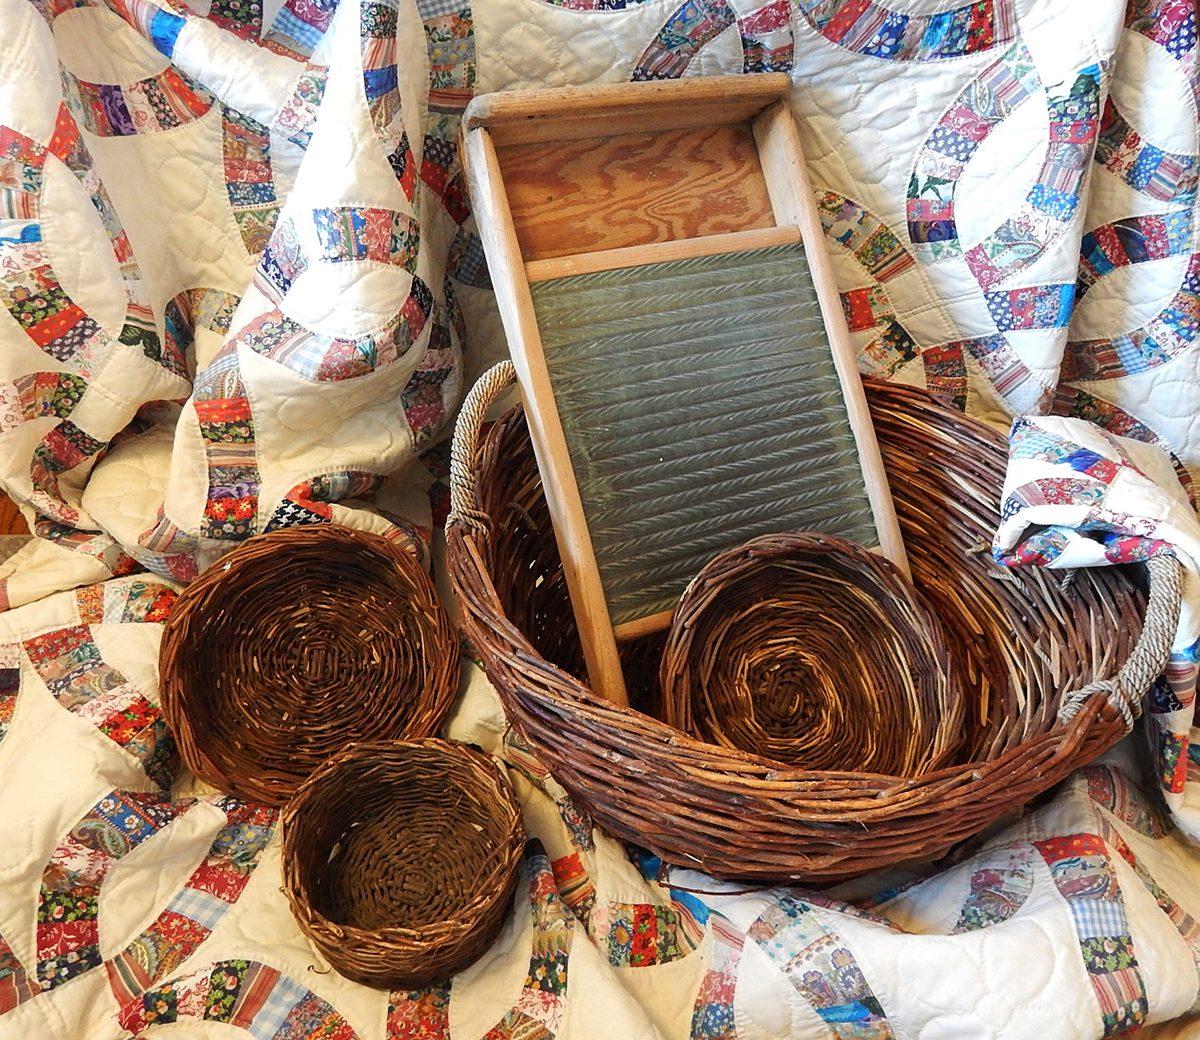 Canadian history - treasured family heirlooms